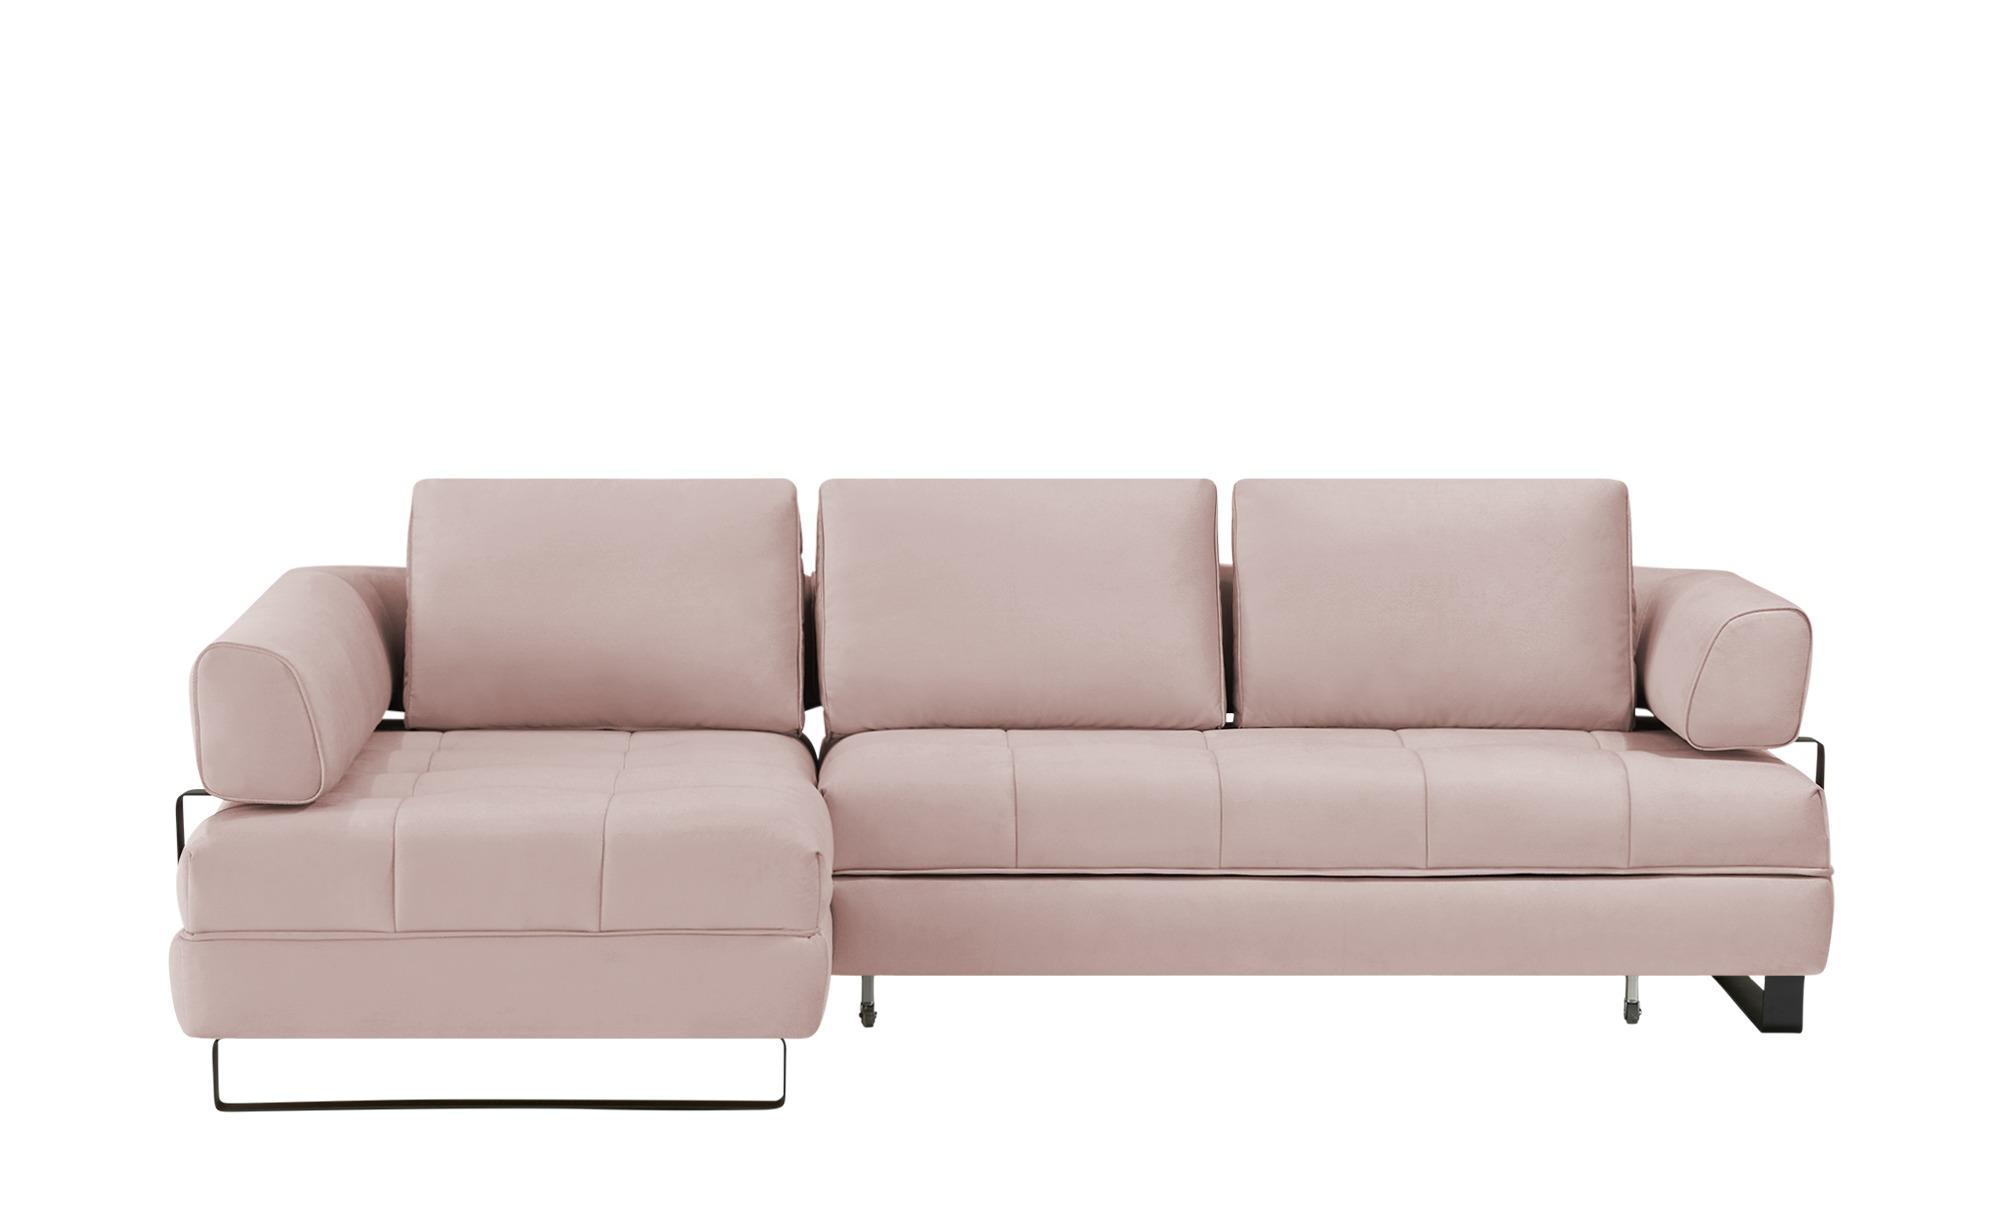 switch Ecksofa  Havana ¦ rosa/pink ¦ Maße (cm): B: 272 H: 89 T: 173 Polstermöbel > Sofas > Ecksofas - Höffner